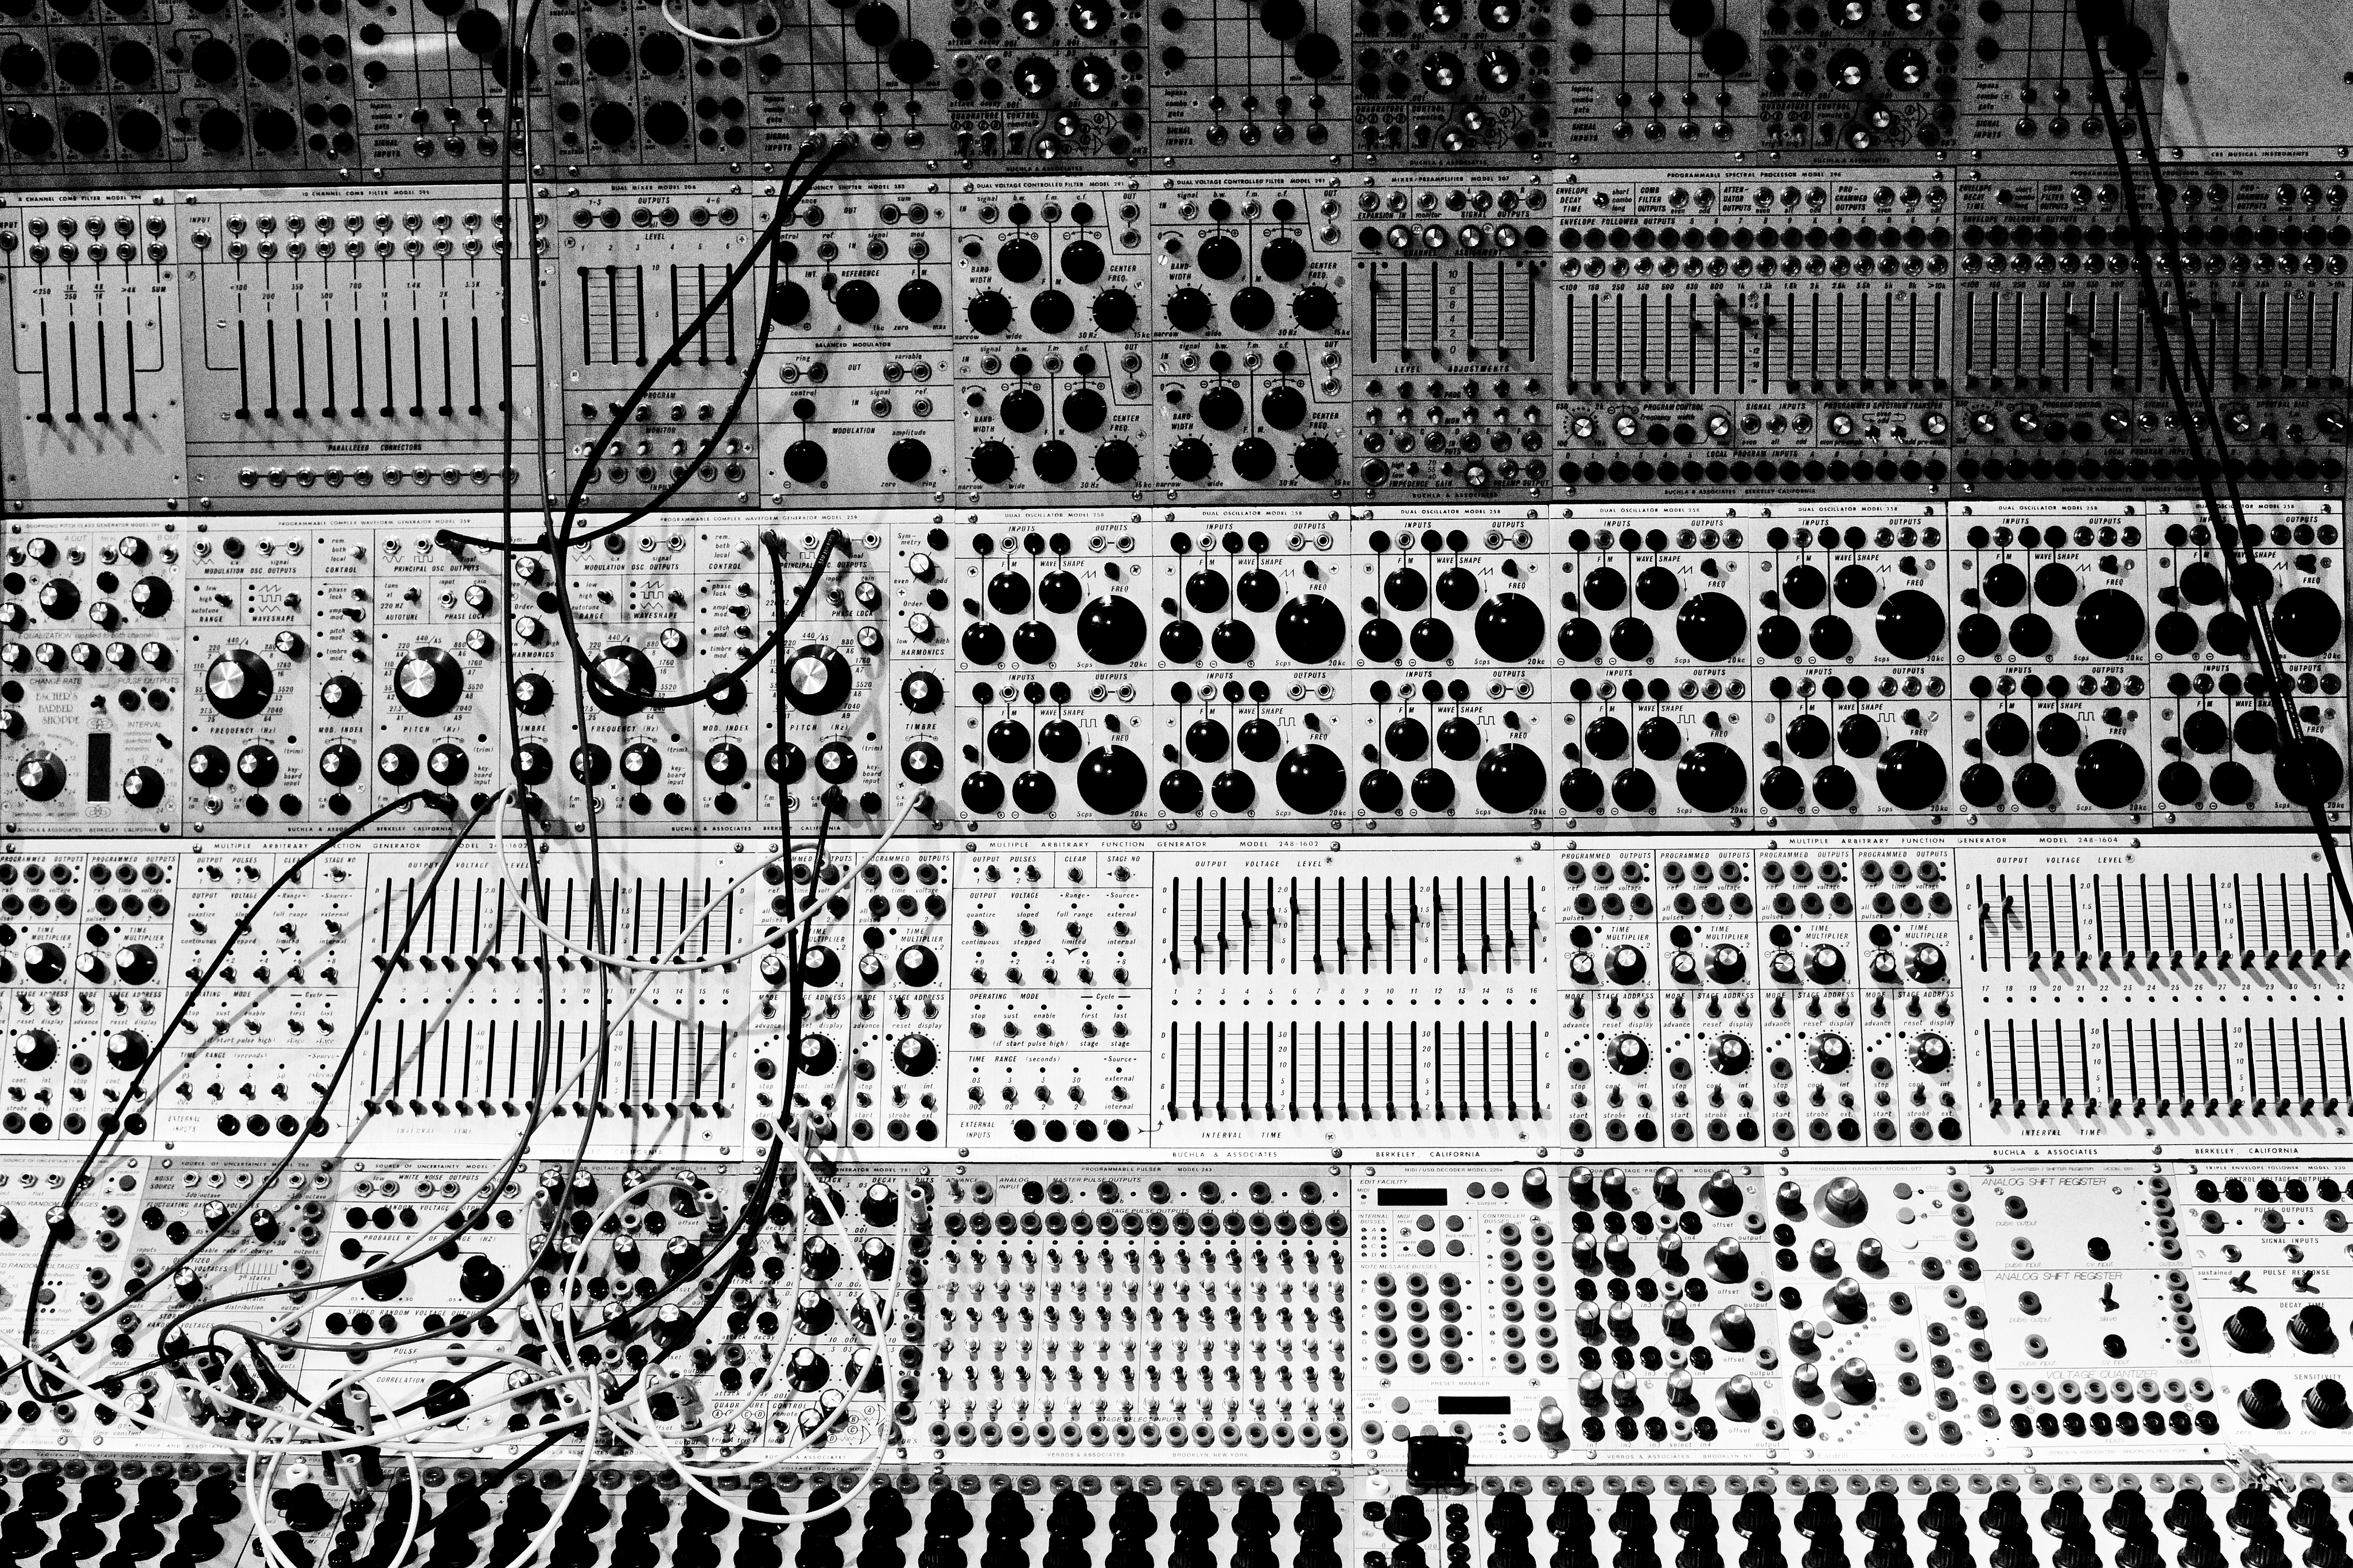 Synthesizer 4k Ultra HD Wallpaper Background Image 4100x2733 4100x2733